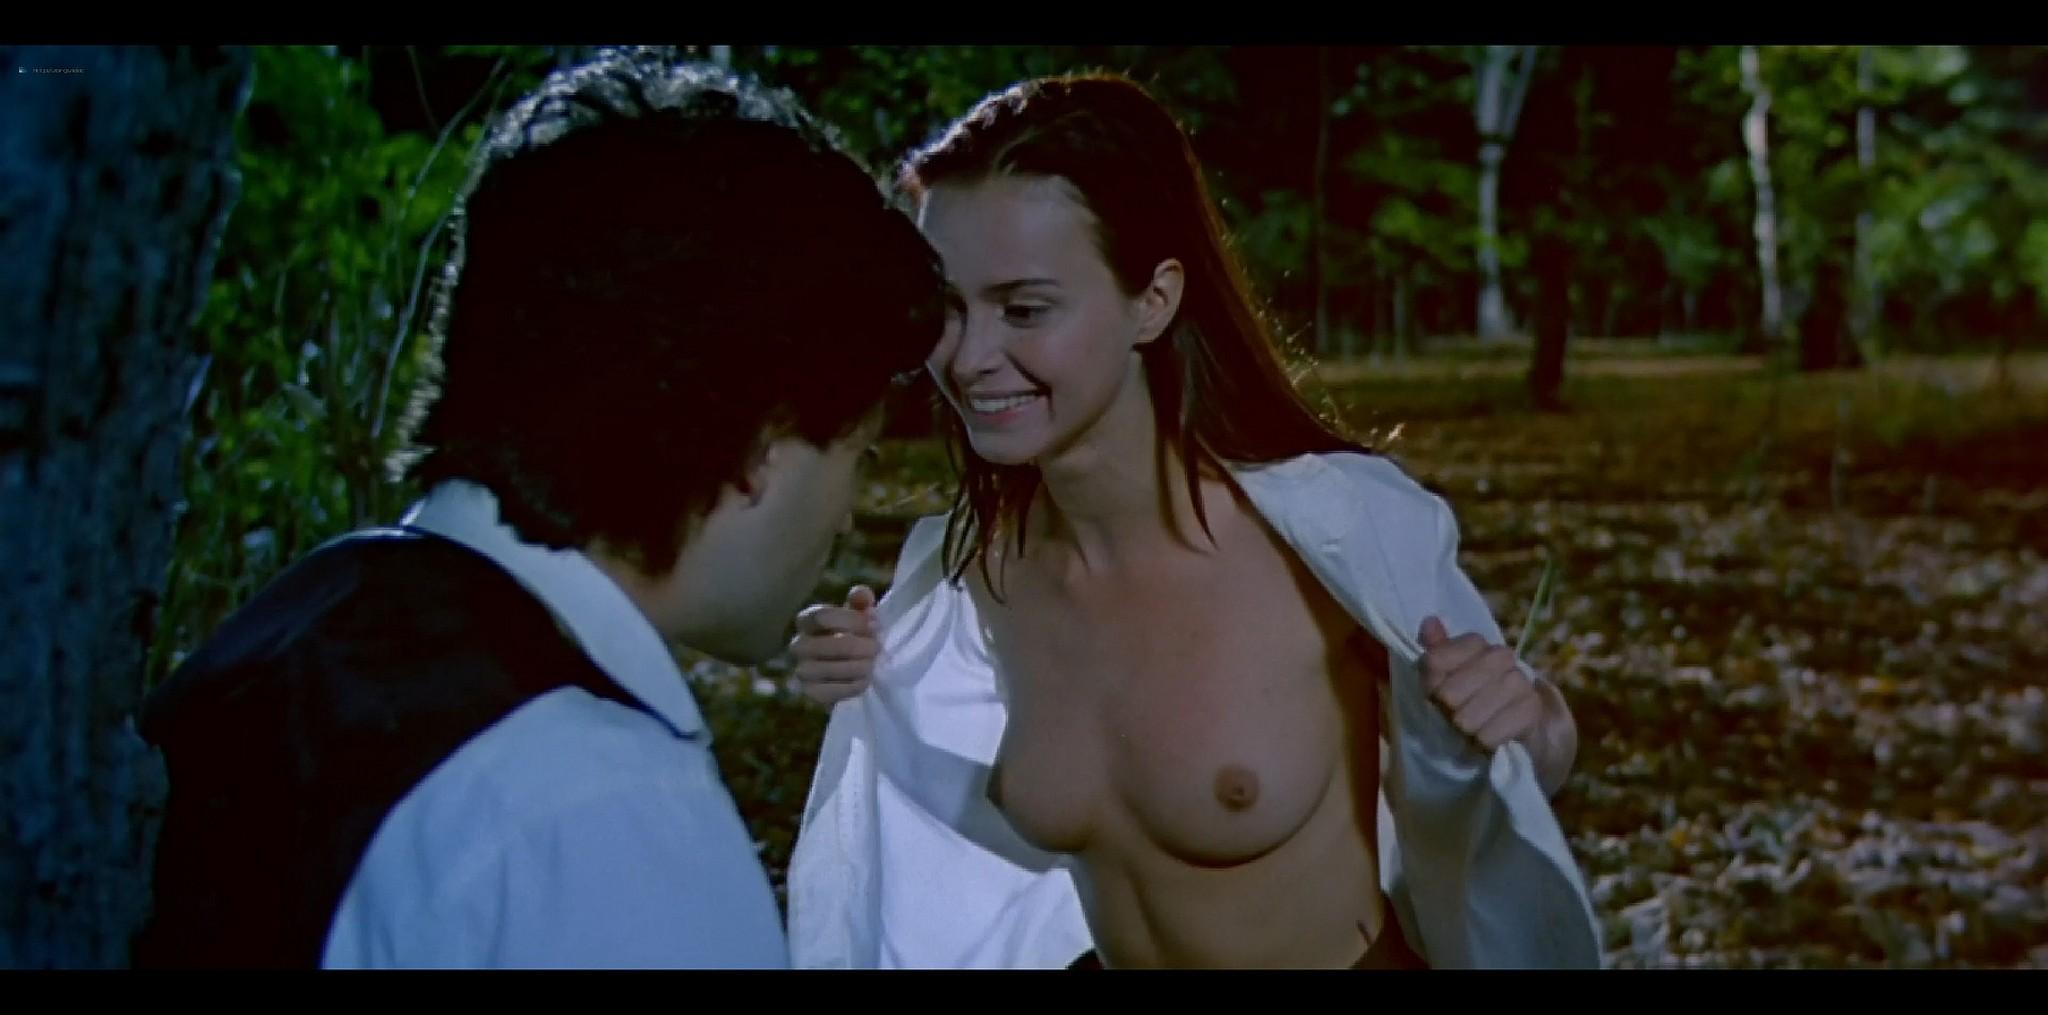 Agathe de La Fontaine nude bush another nude full frontal Train de vie FR 1998 HD 1080p BluRay 009